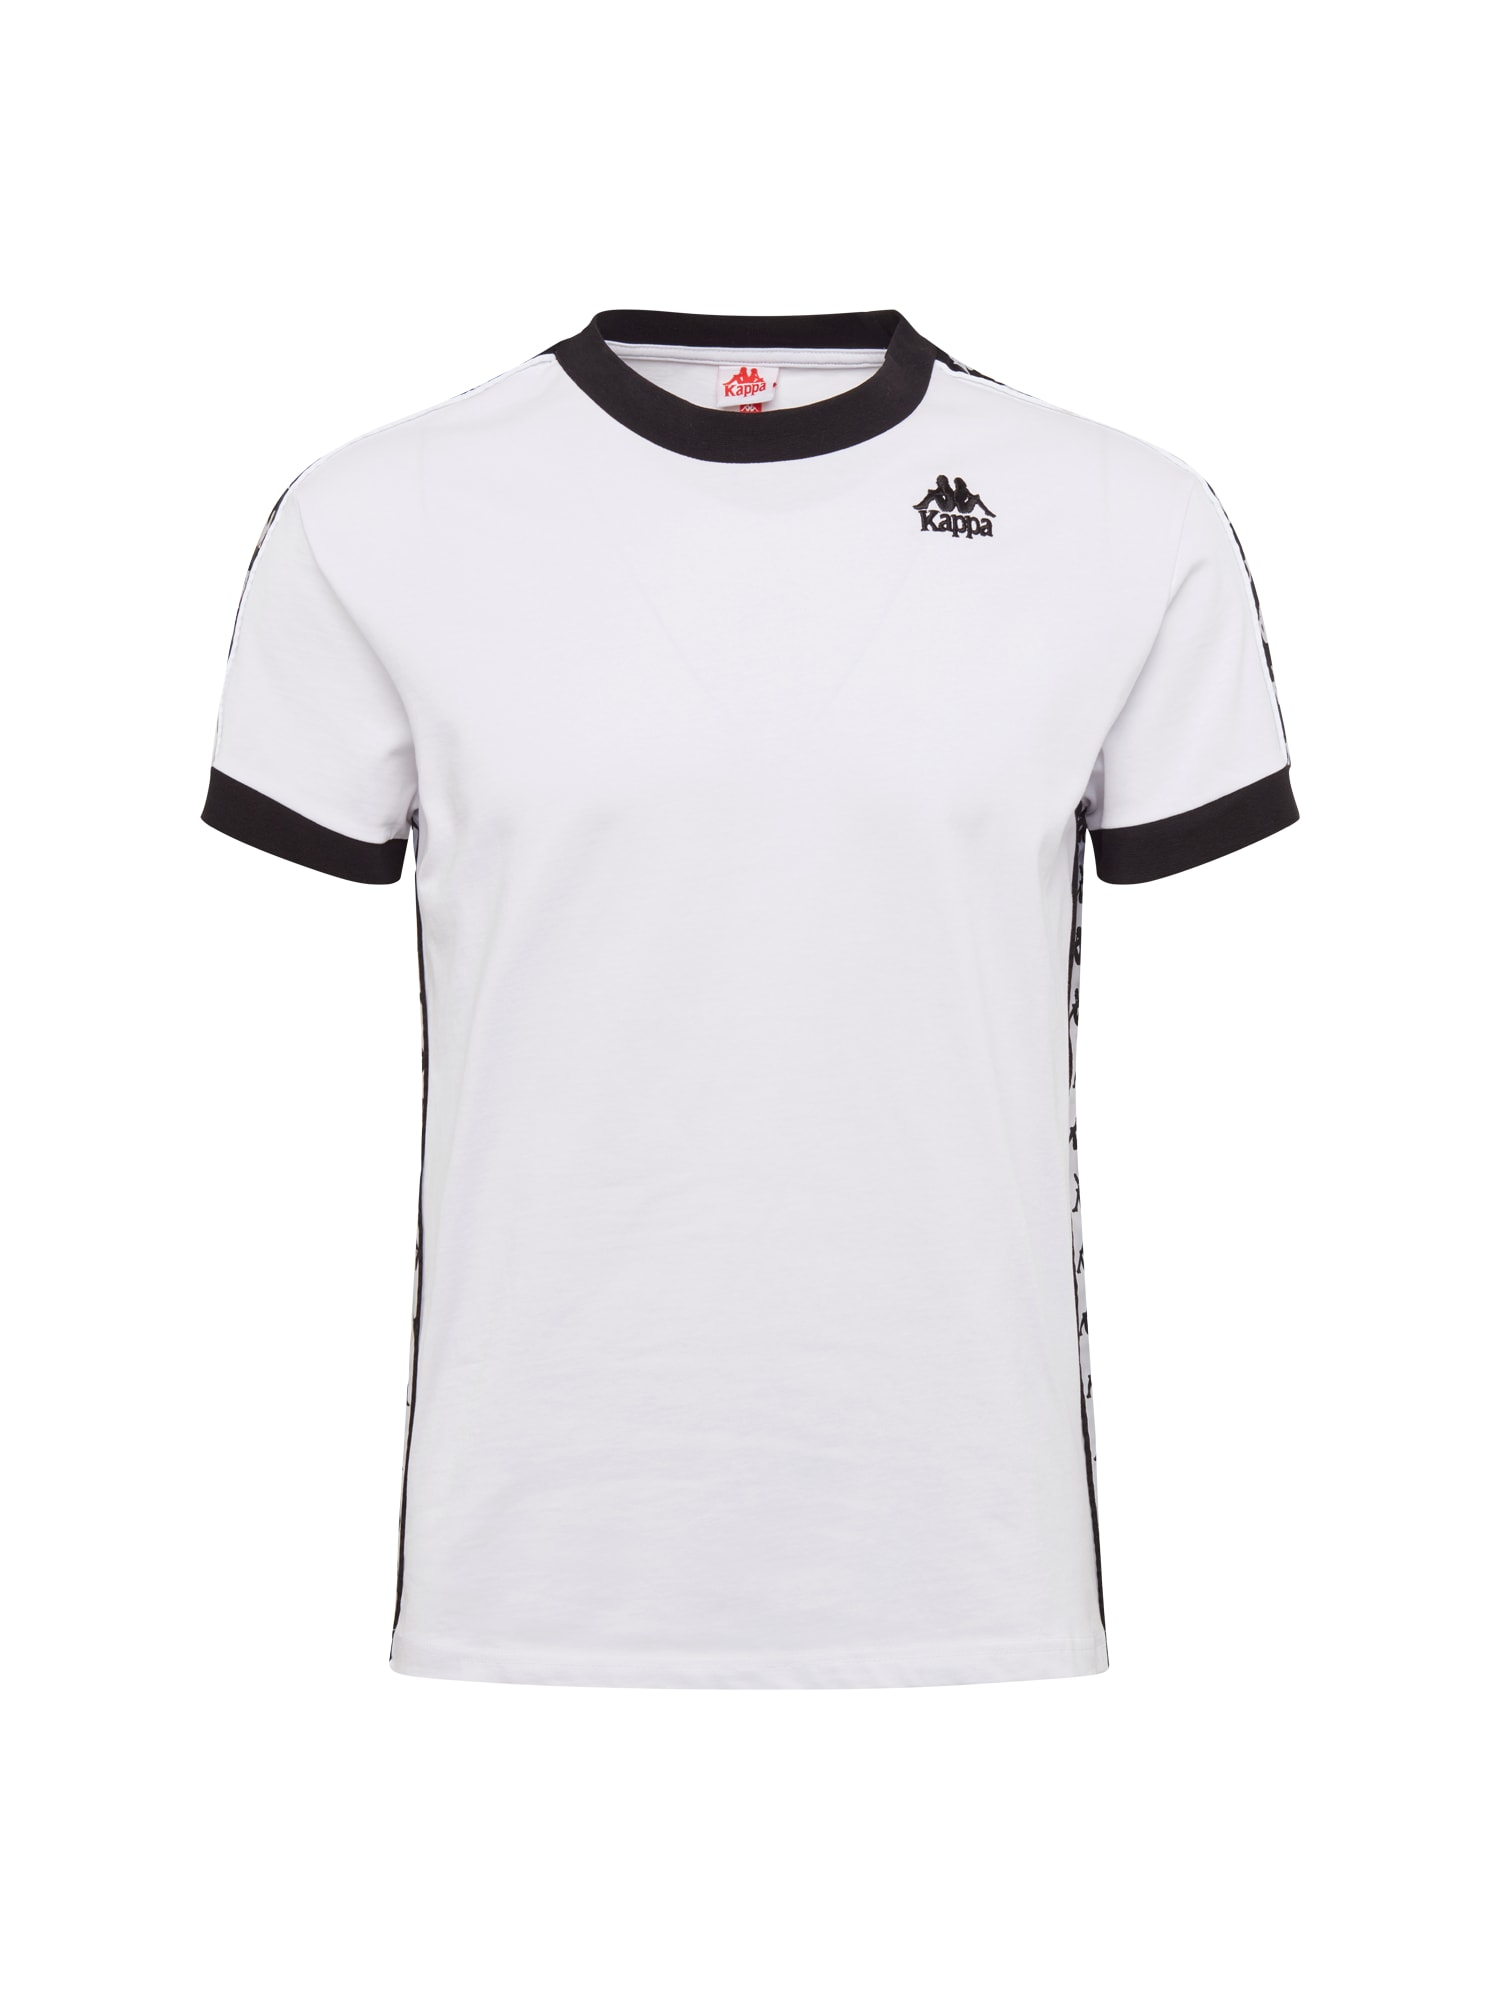 Tričko Banda Bismal černá bílá KAPPA